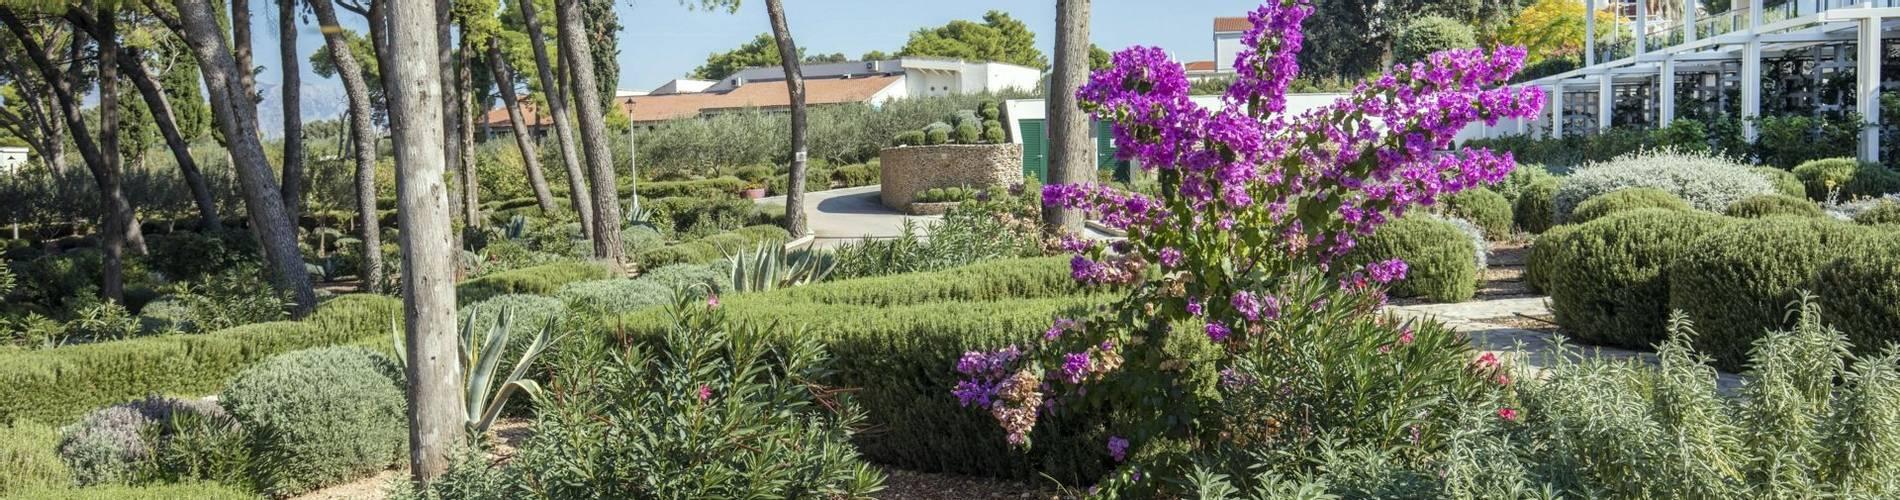 07 Resort_Velaris - Garden (4) (1).jpg